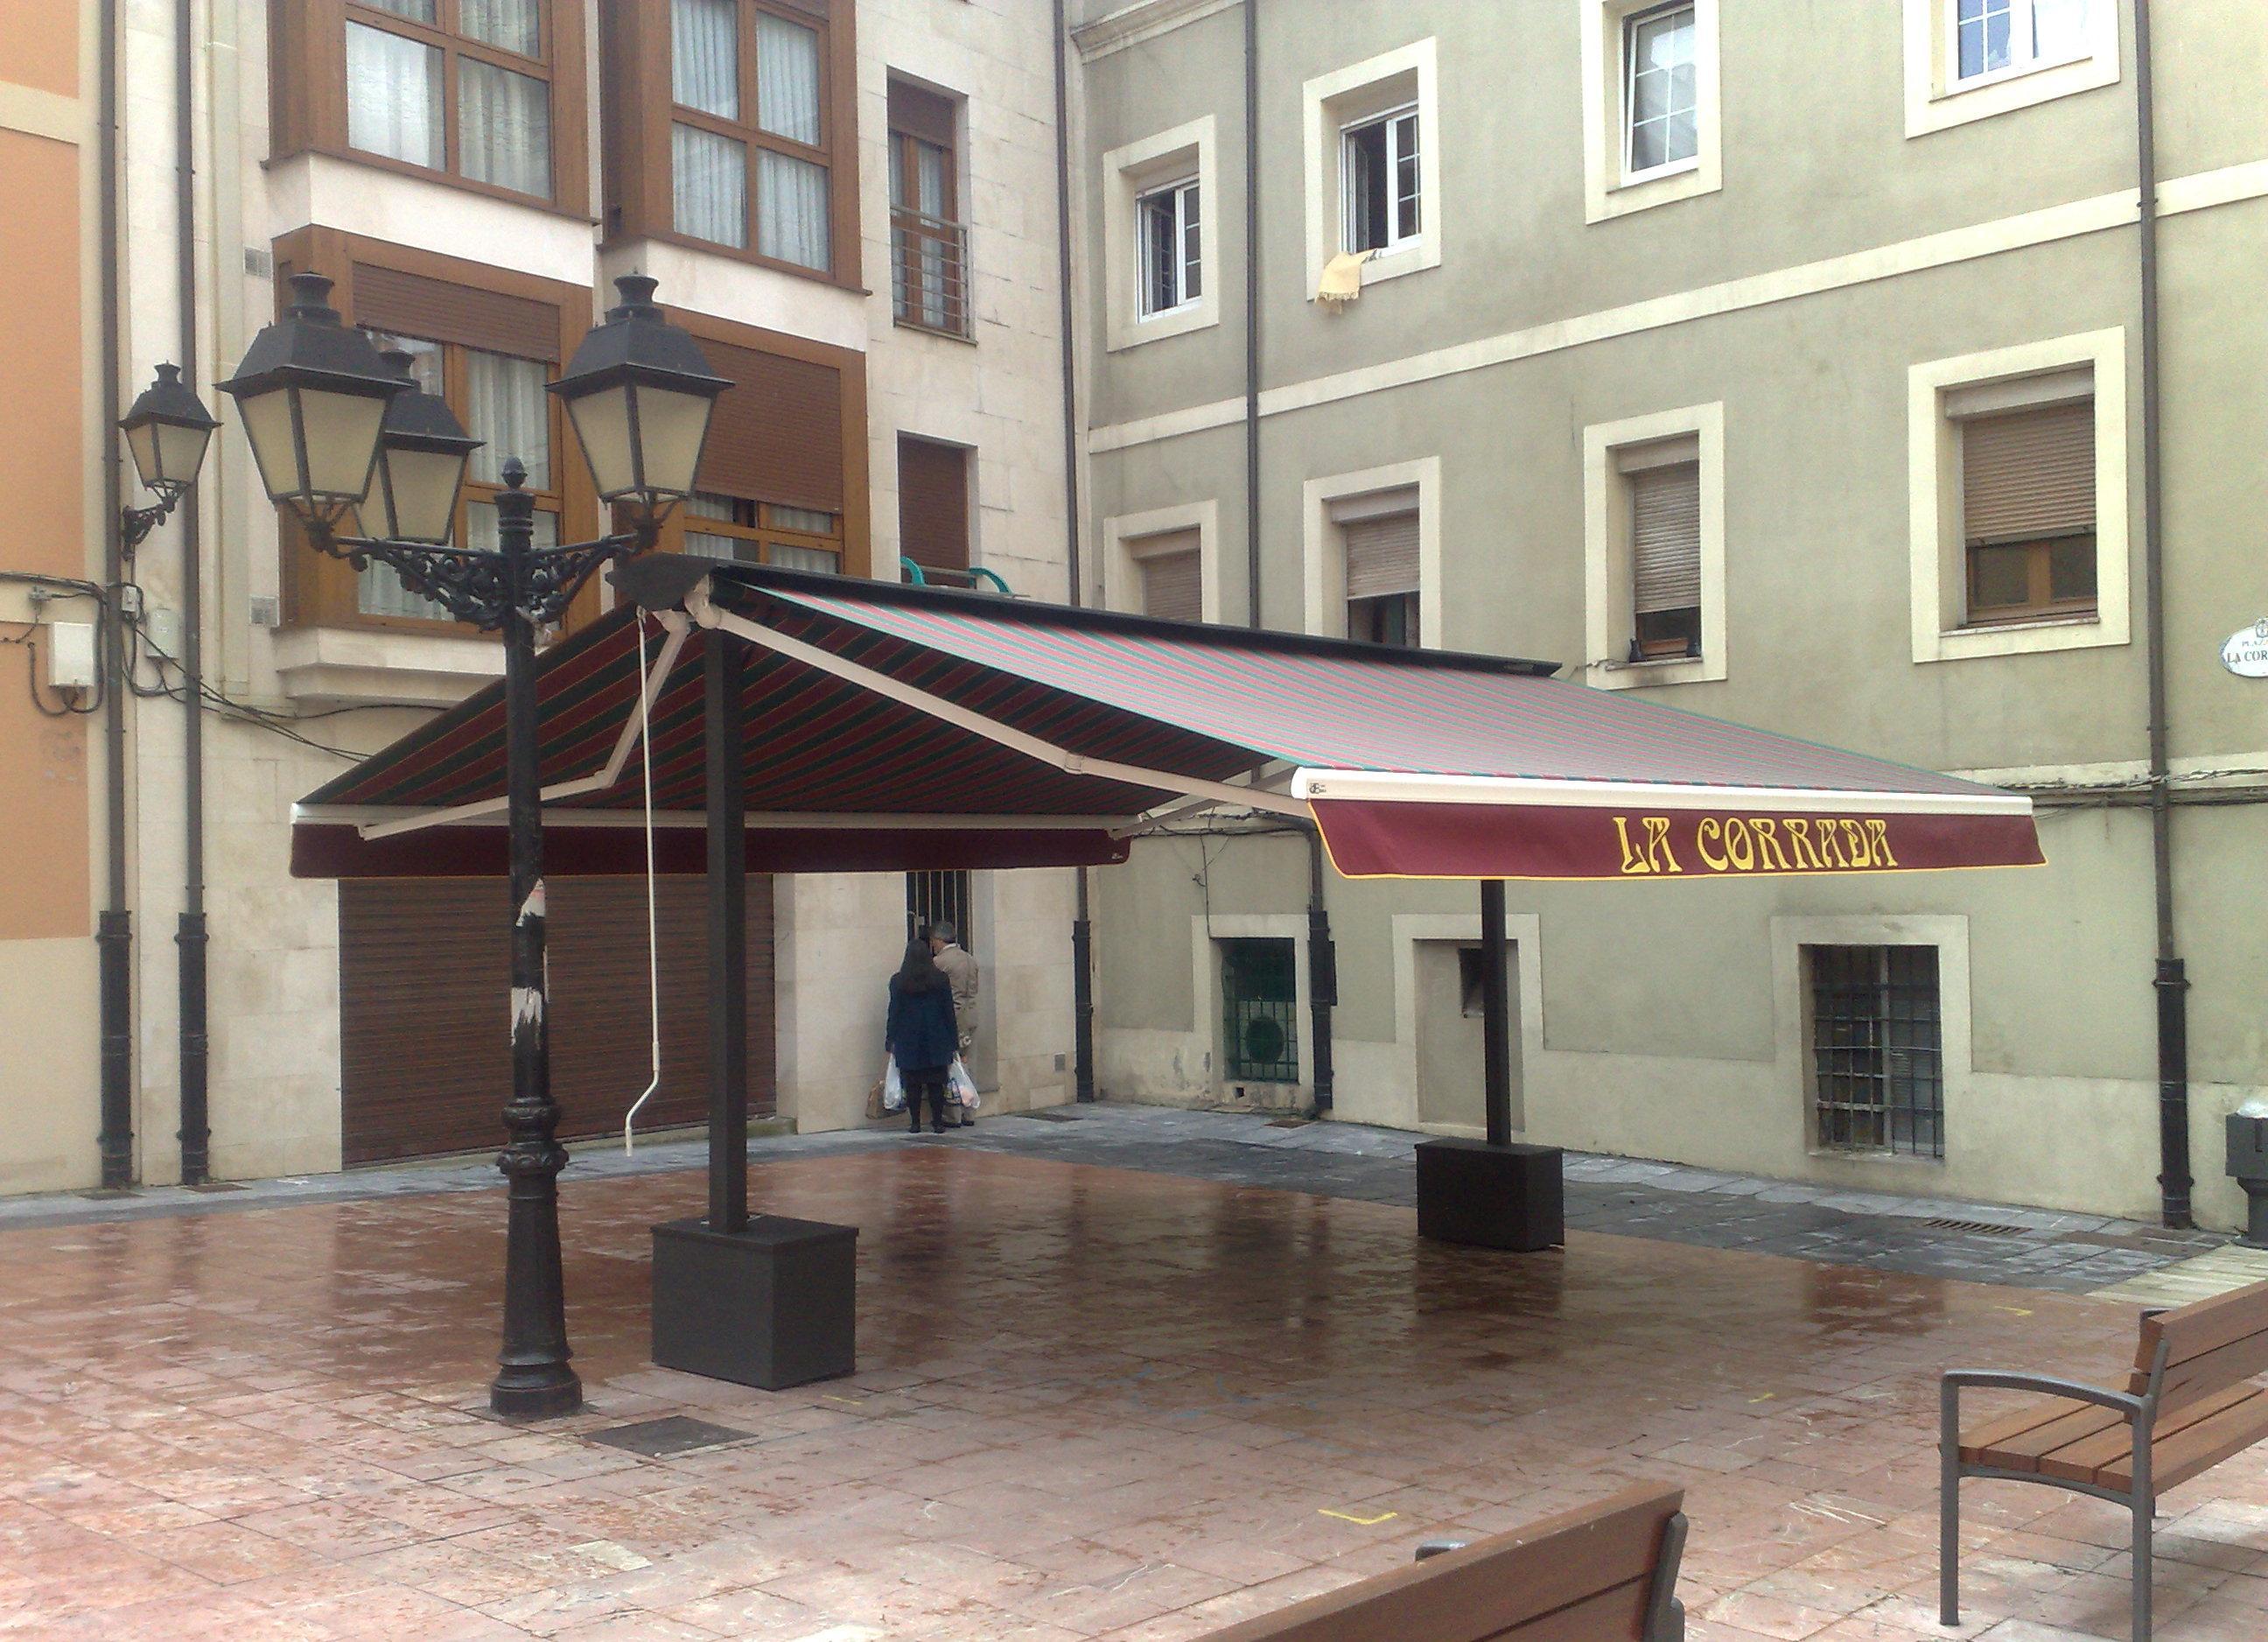 Toldos para terrazas en gij n con los ltimos adelantos for Toldos para terrazas precios